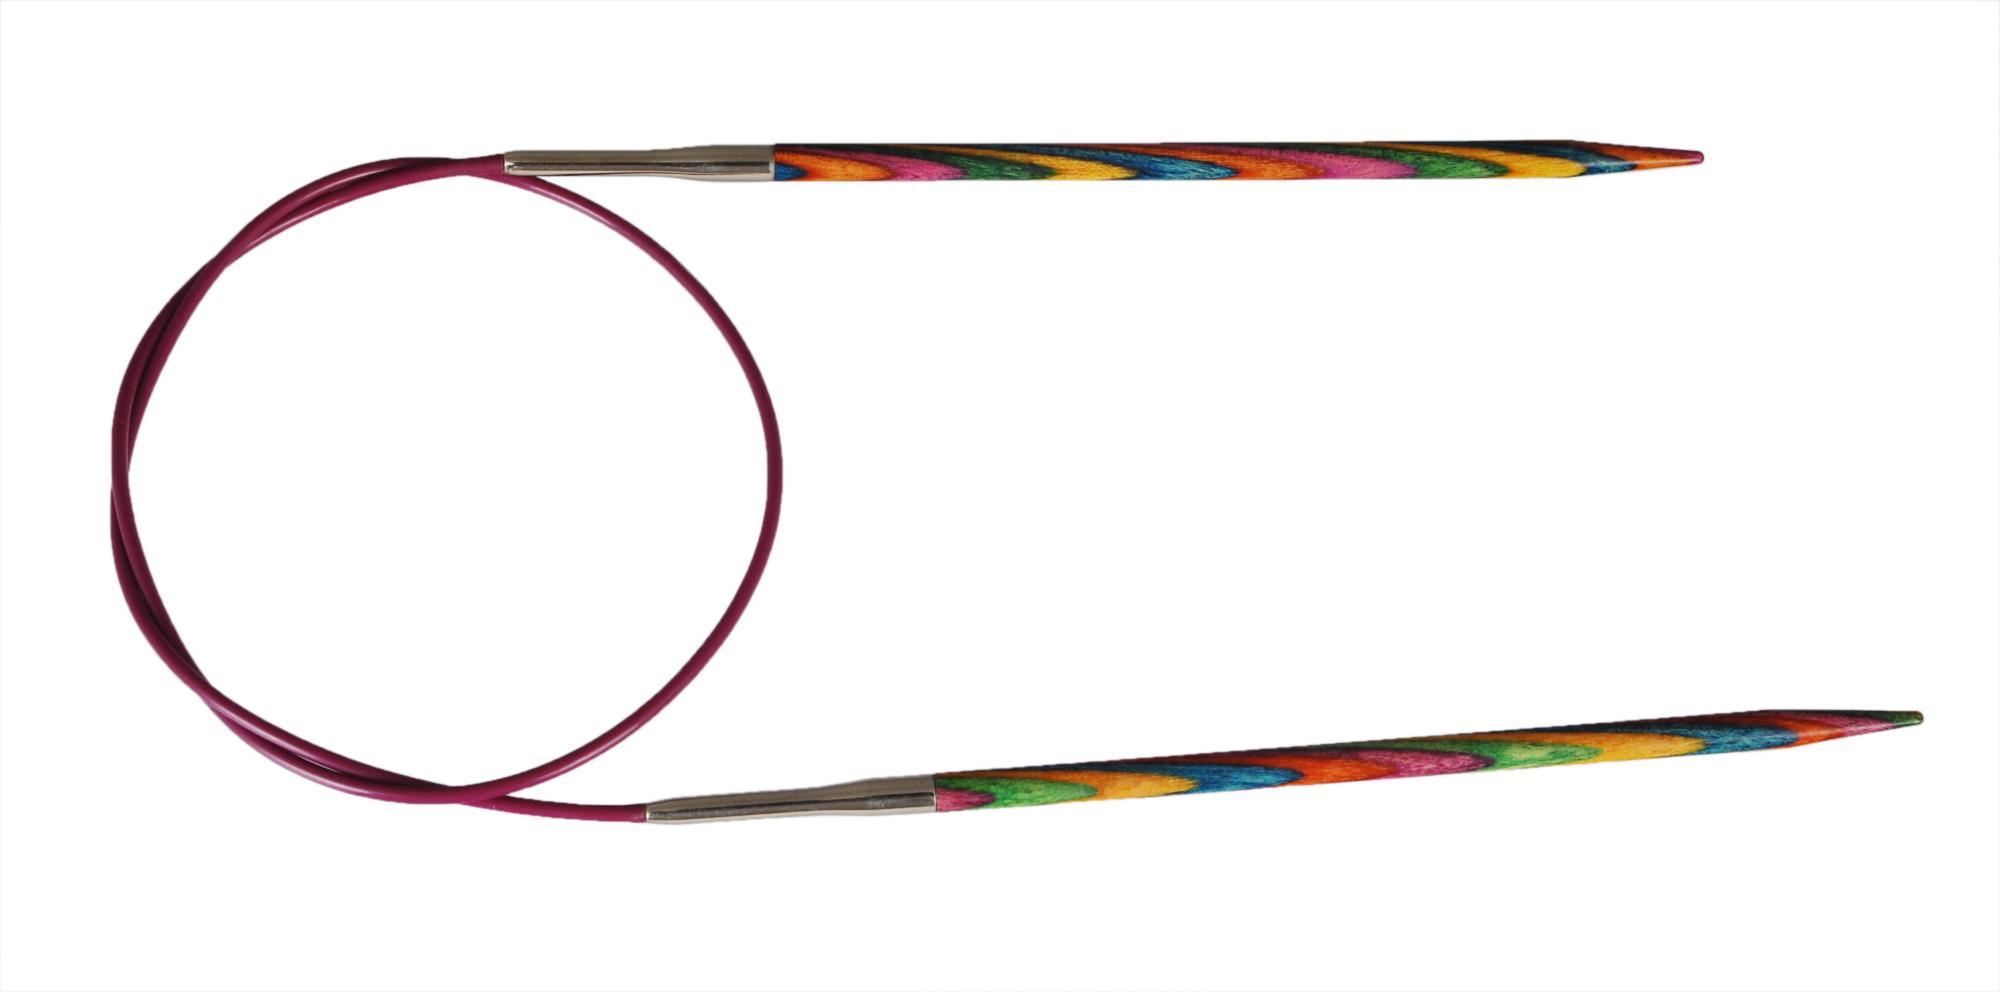 Спицы круговые 80 см Symfonie Wood KnitPro, 20331, 2.00 мм